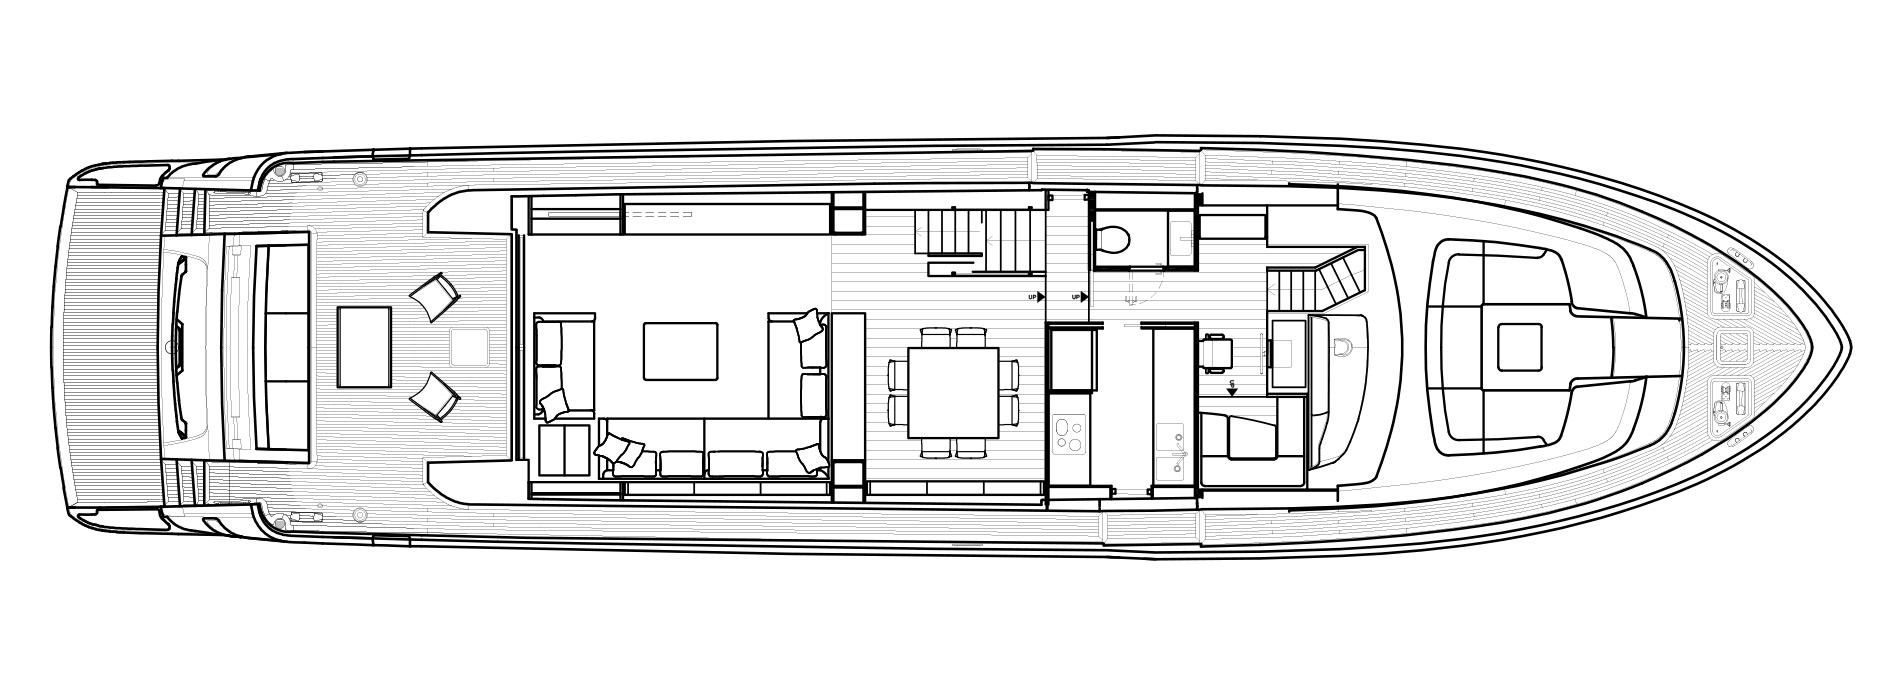 Sanlorenzo Yachts SL86 Cubierta principal Versione A